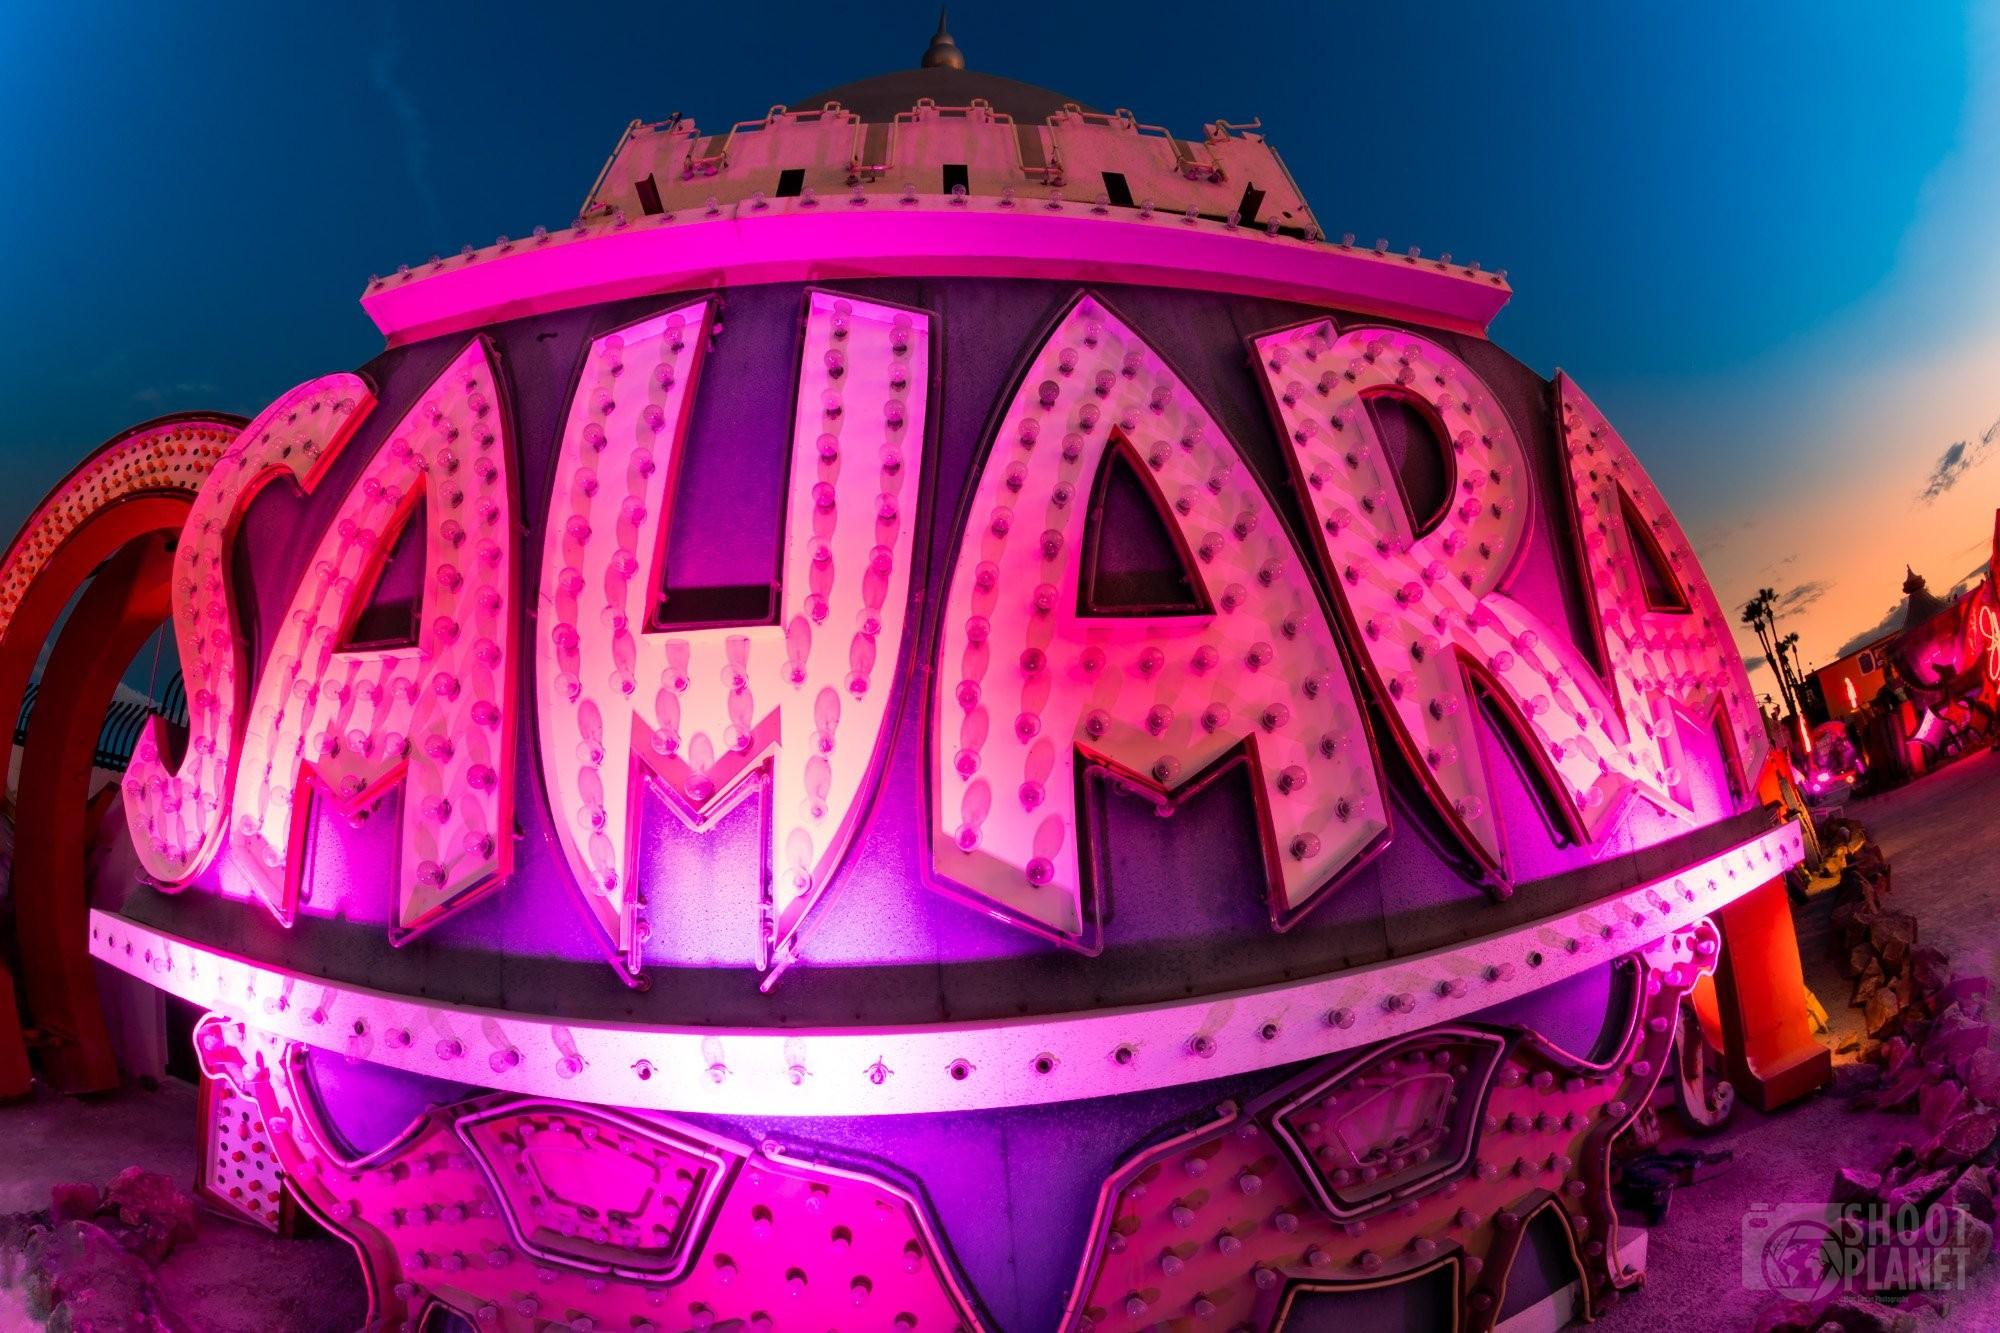 Vintage Sahara casino neon sign, Las Vegas